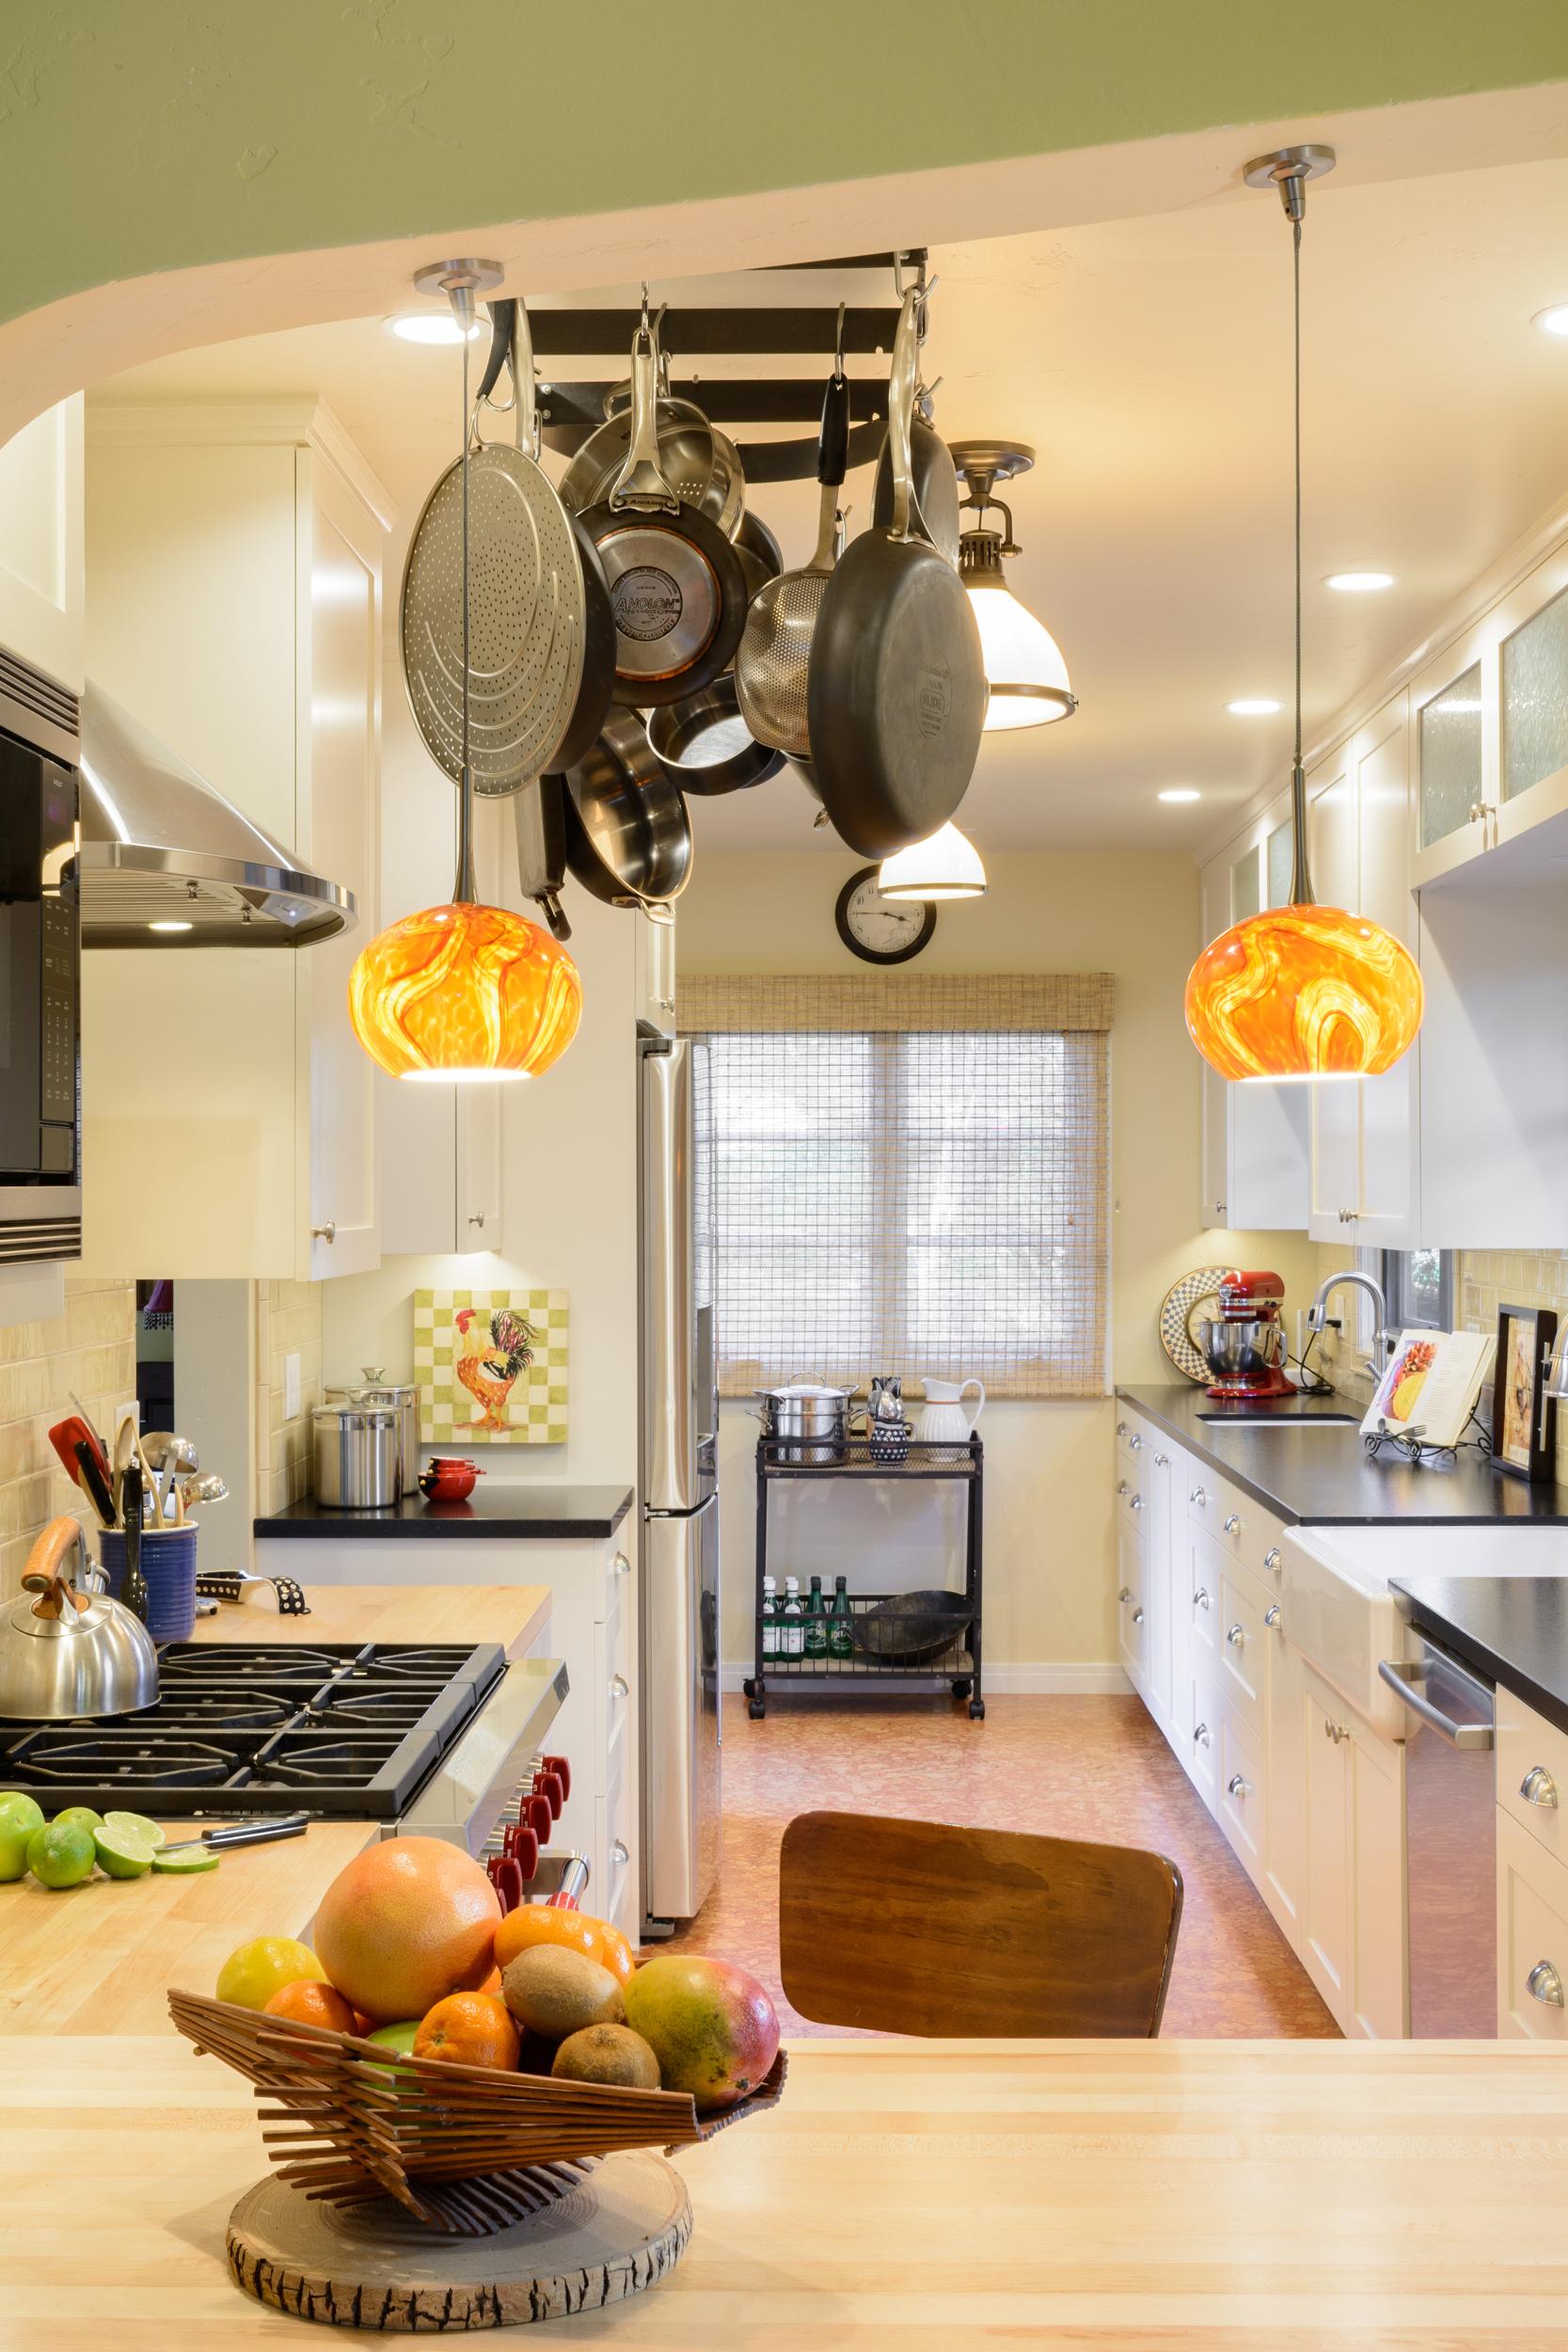 Bright and warm old world kitchen